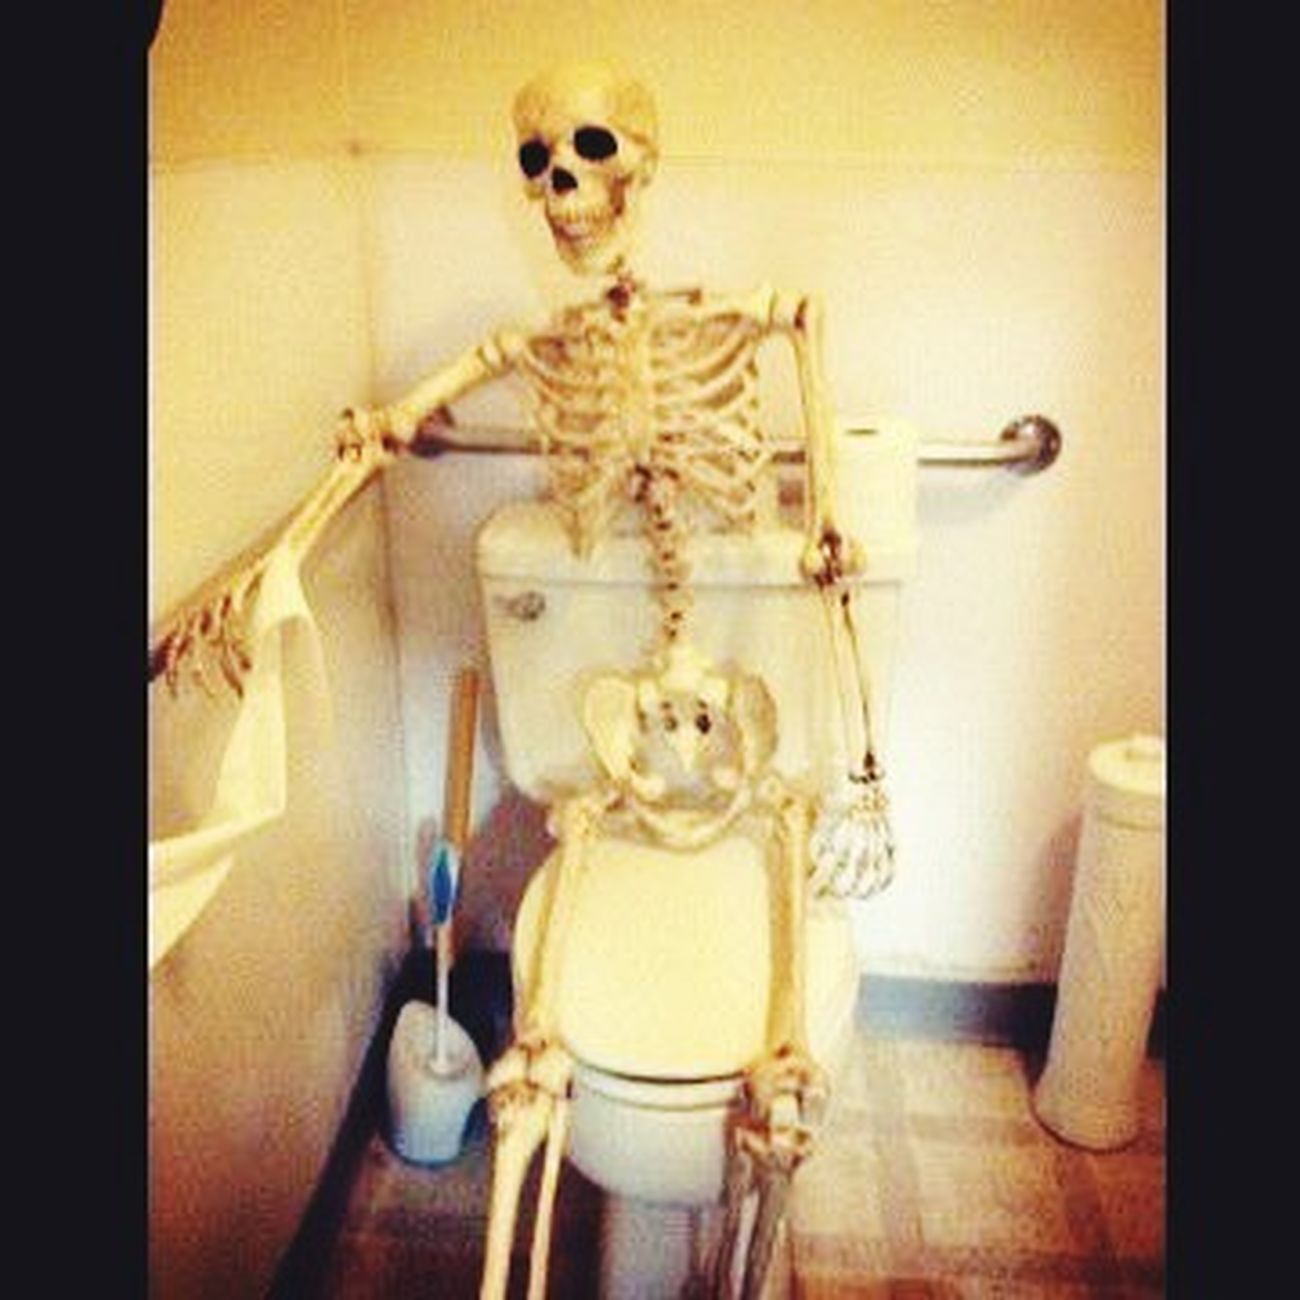 Brokinbonz Brokinbonz Clothing Toilet Skateboarding Skeleton Yisgoi